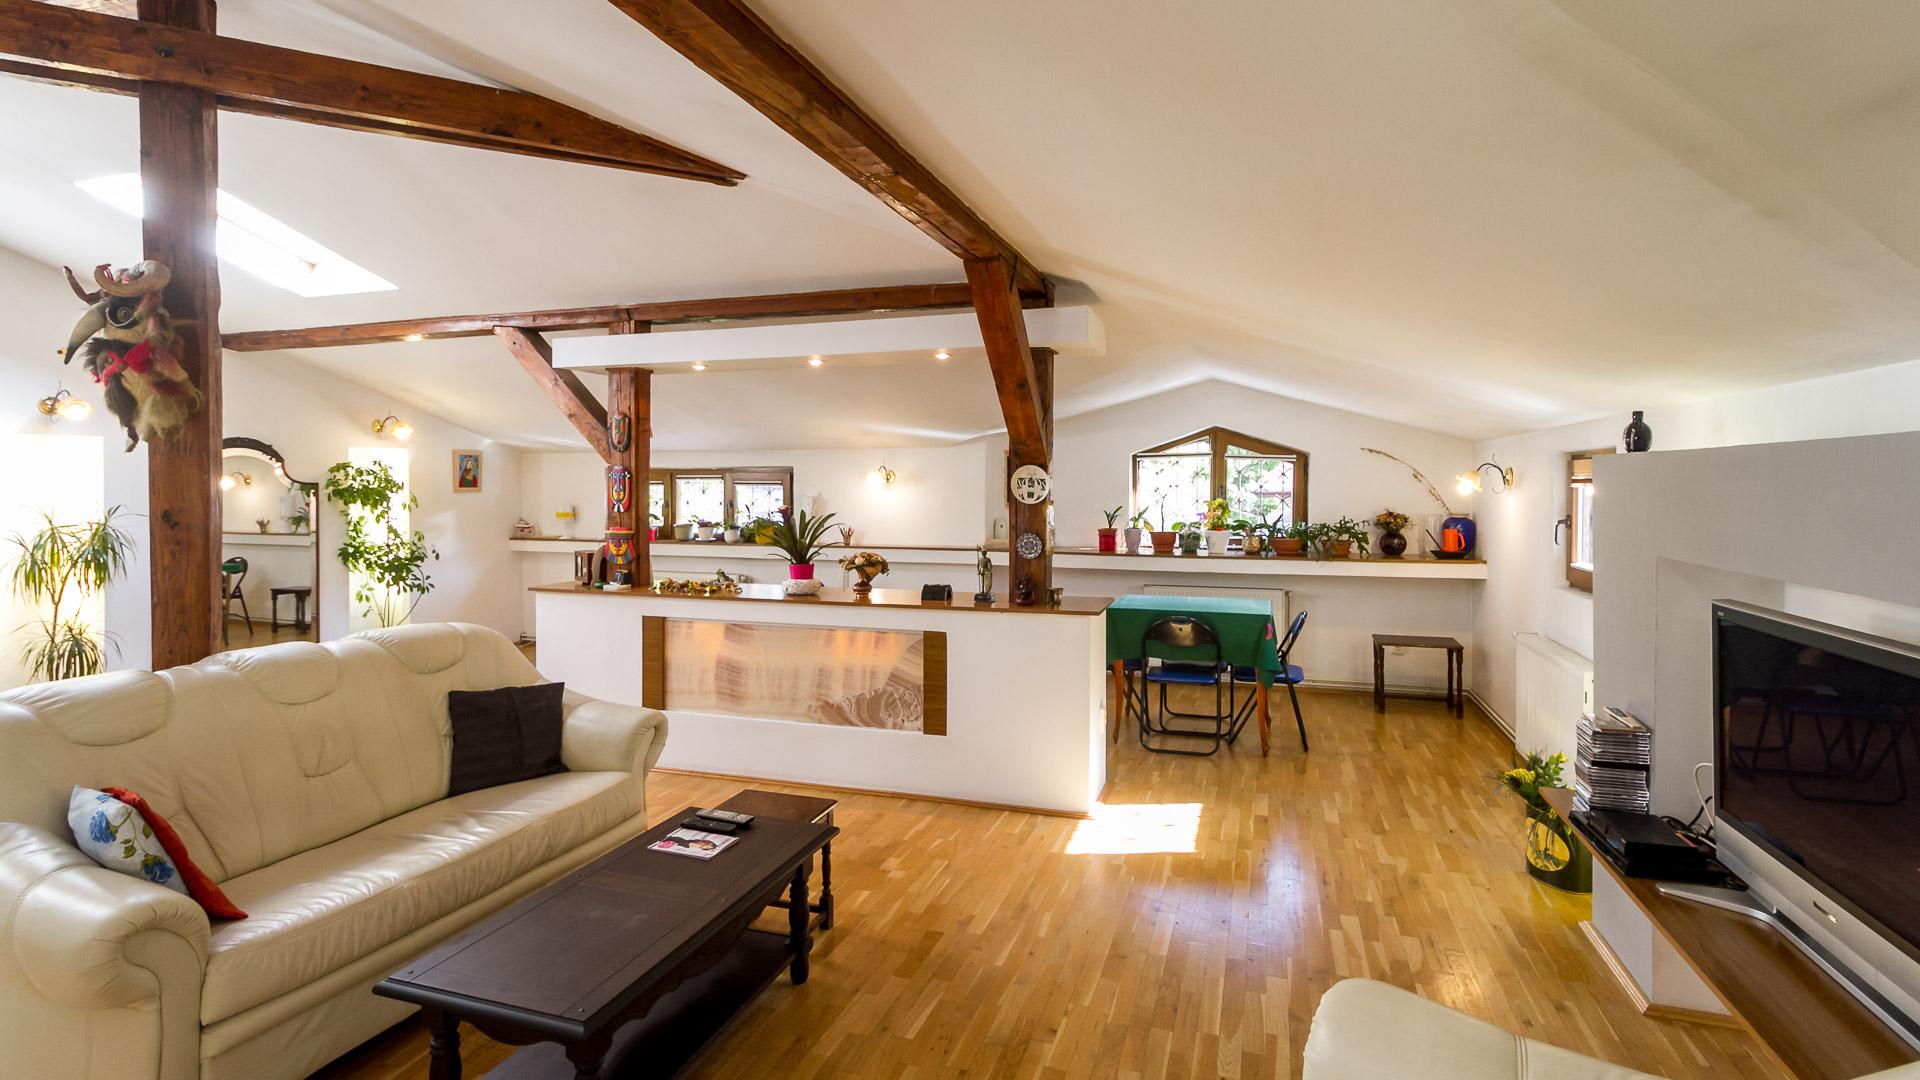 spatiu-socializare-living-apartament-3-camere-2-bai-mansarda-vila-arhitectura-interbelica